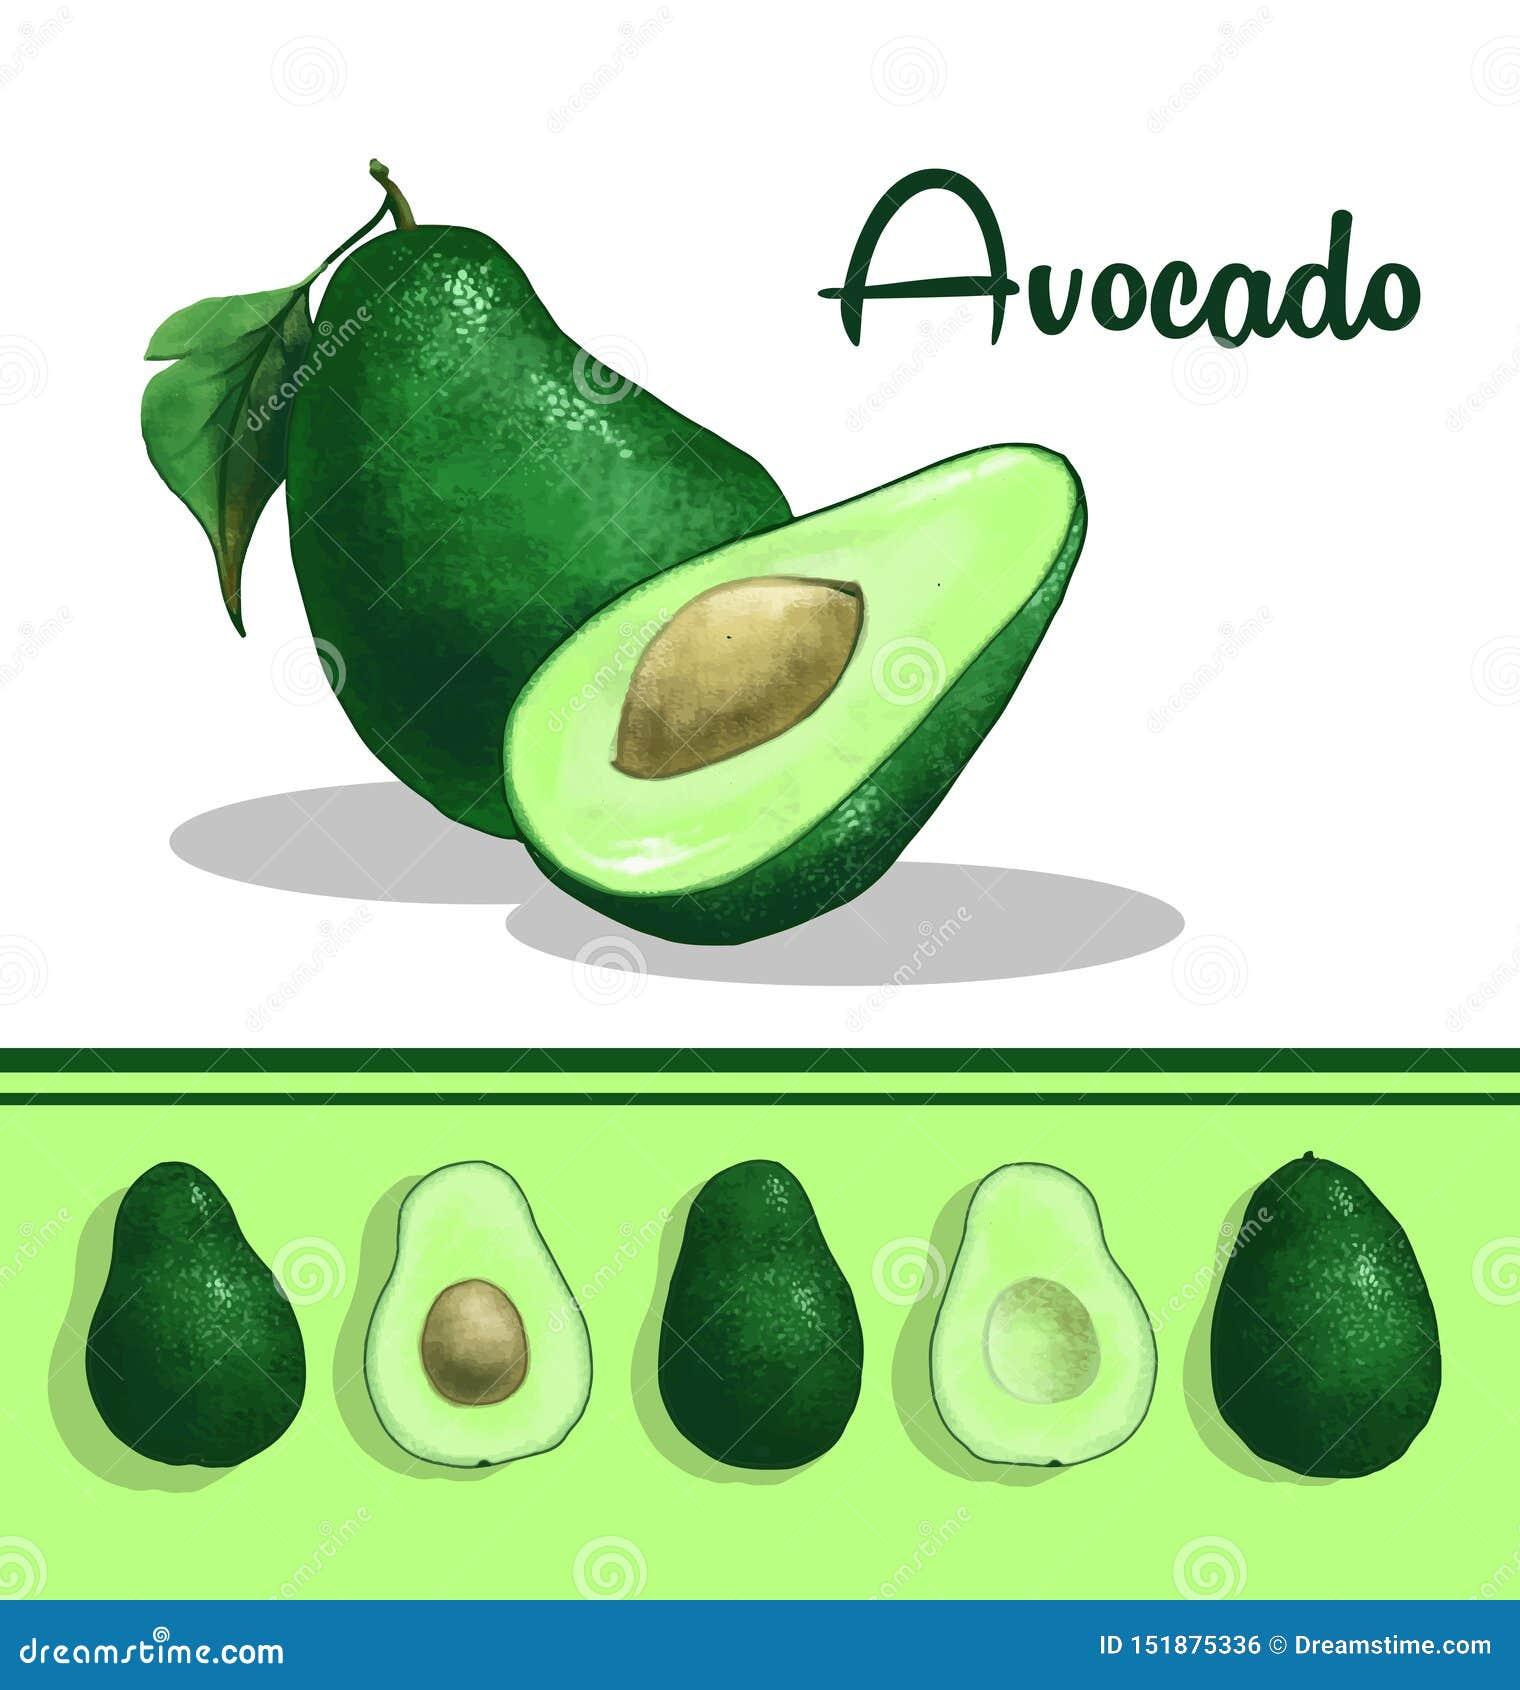 Avocadoclipart